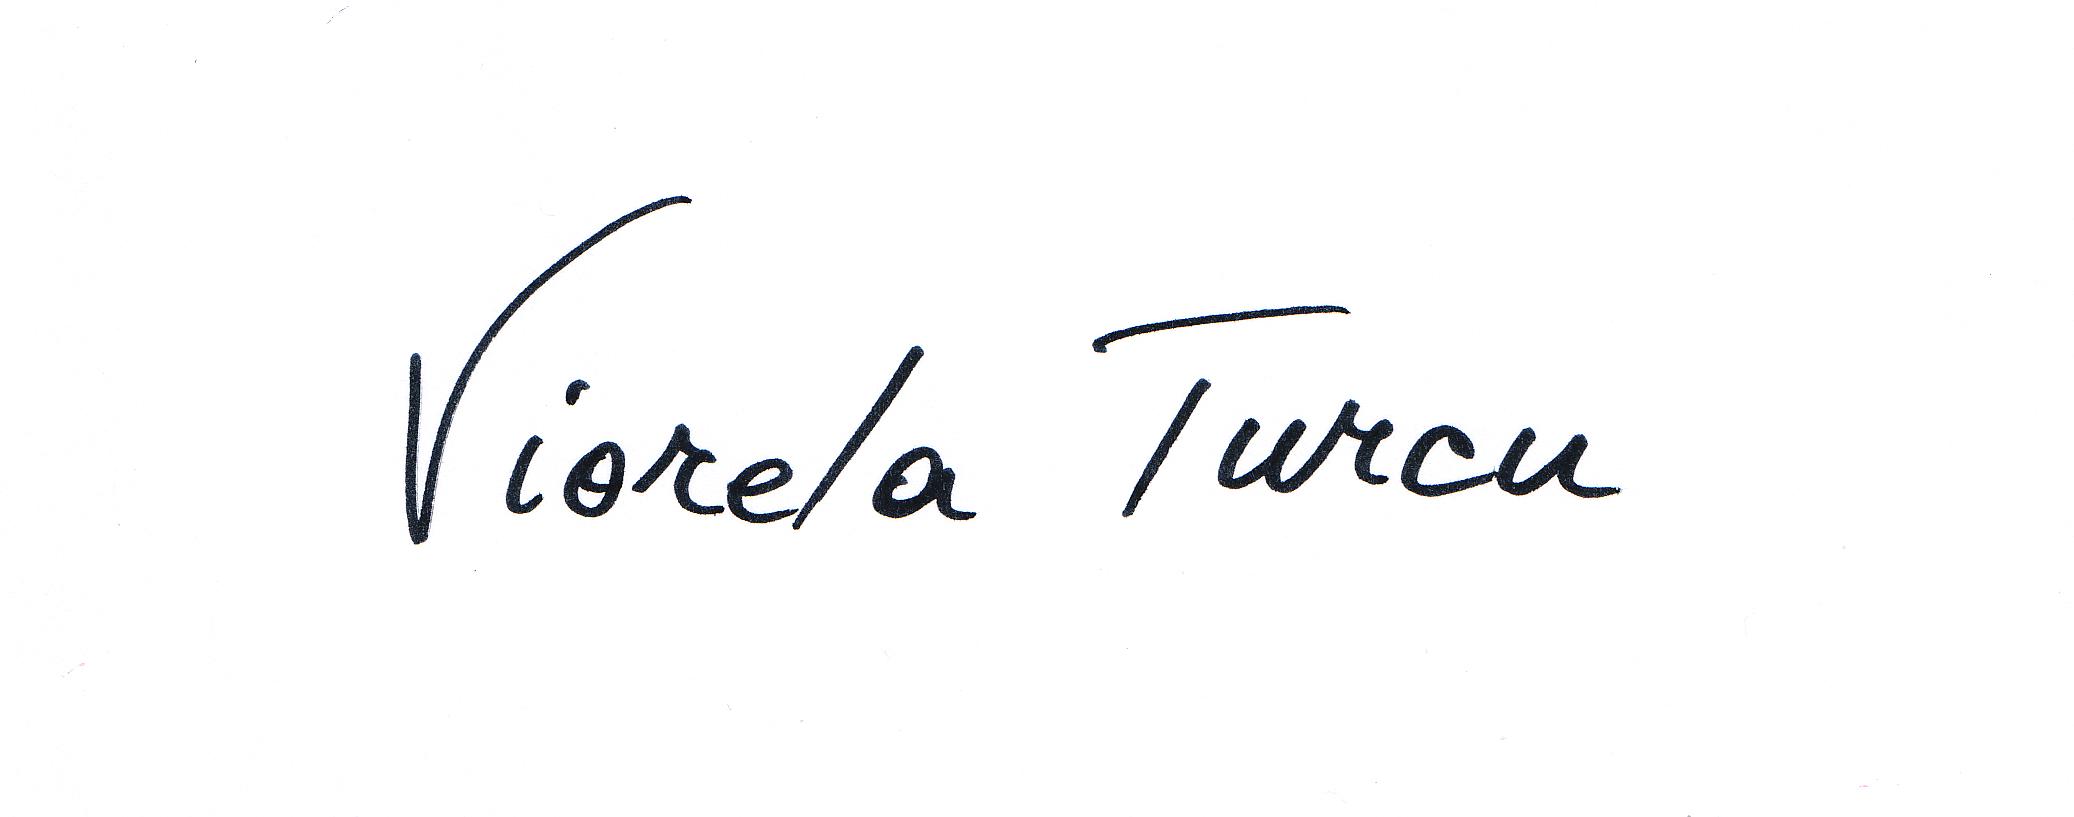 viorela turcu's Signature